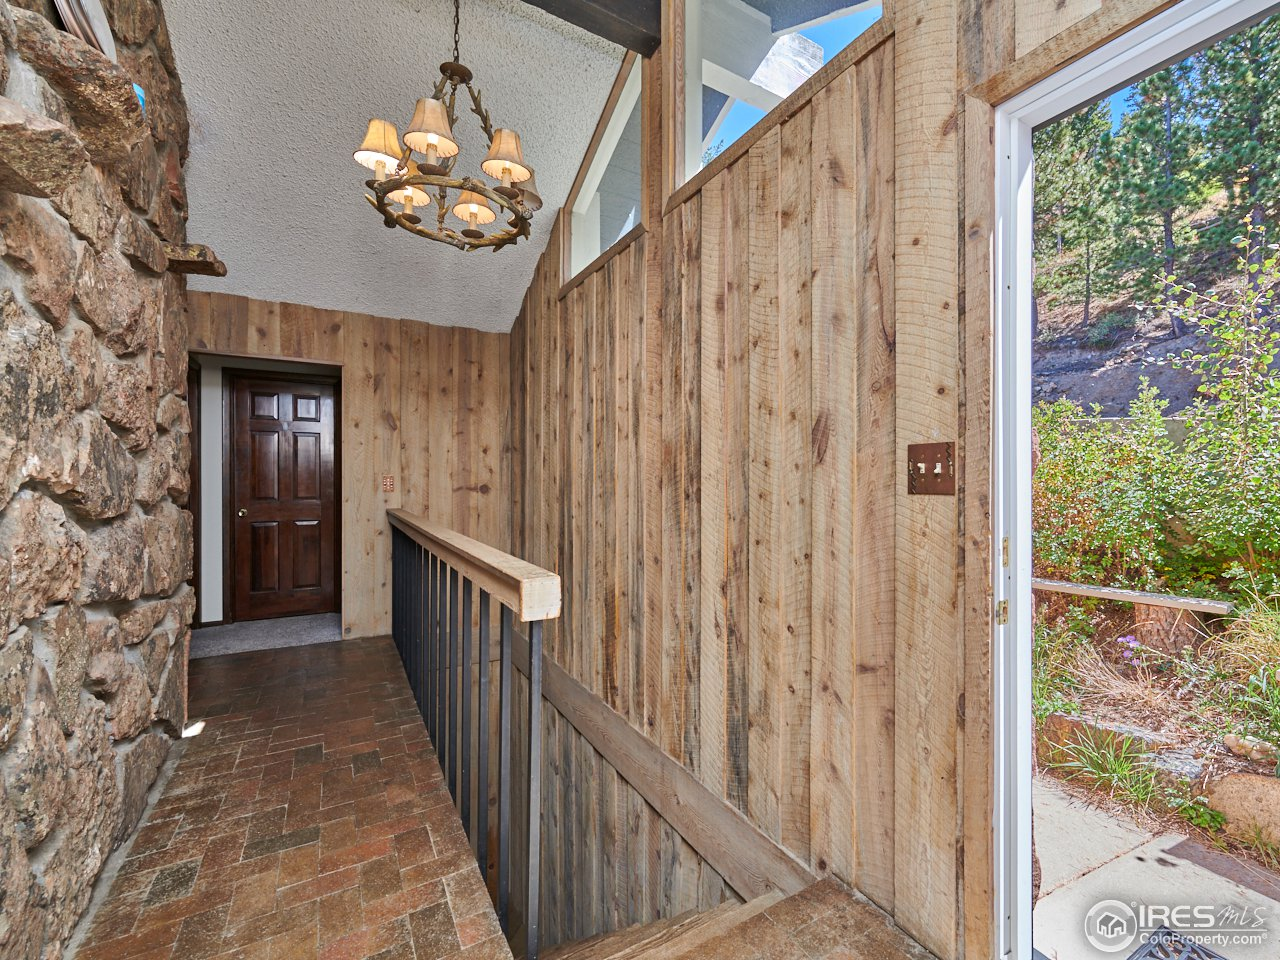 Entrance with brick floors